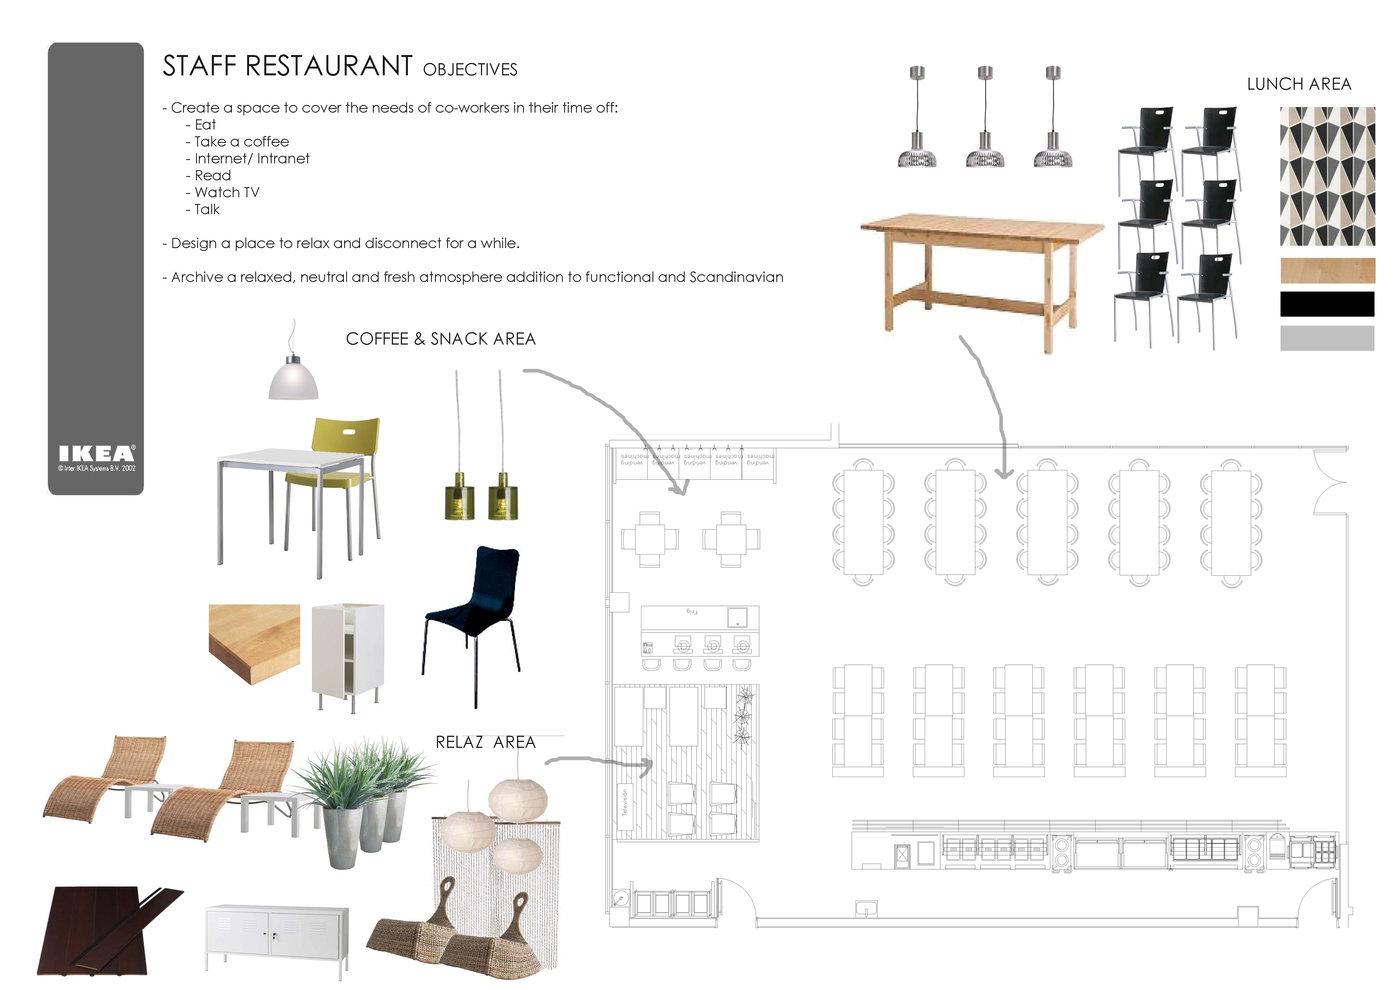 Professional Projects by Elena Rodríguez at Coroflot com